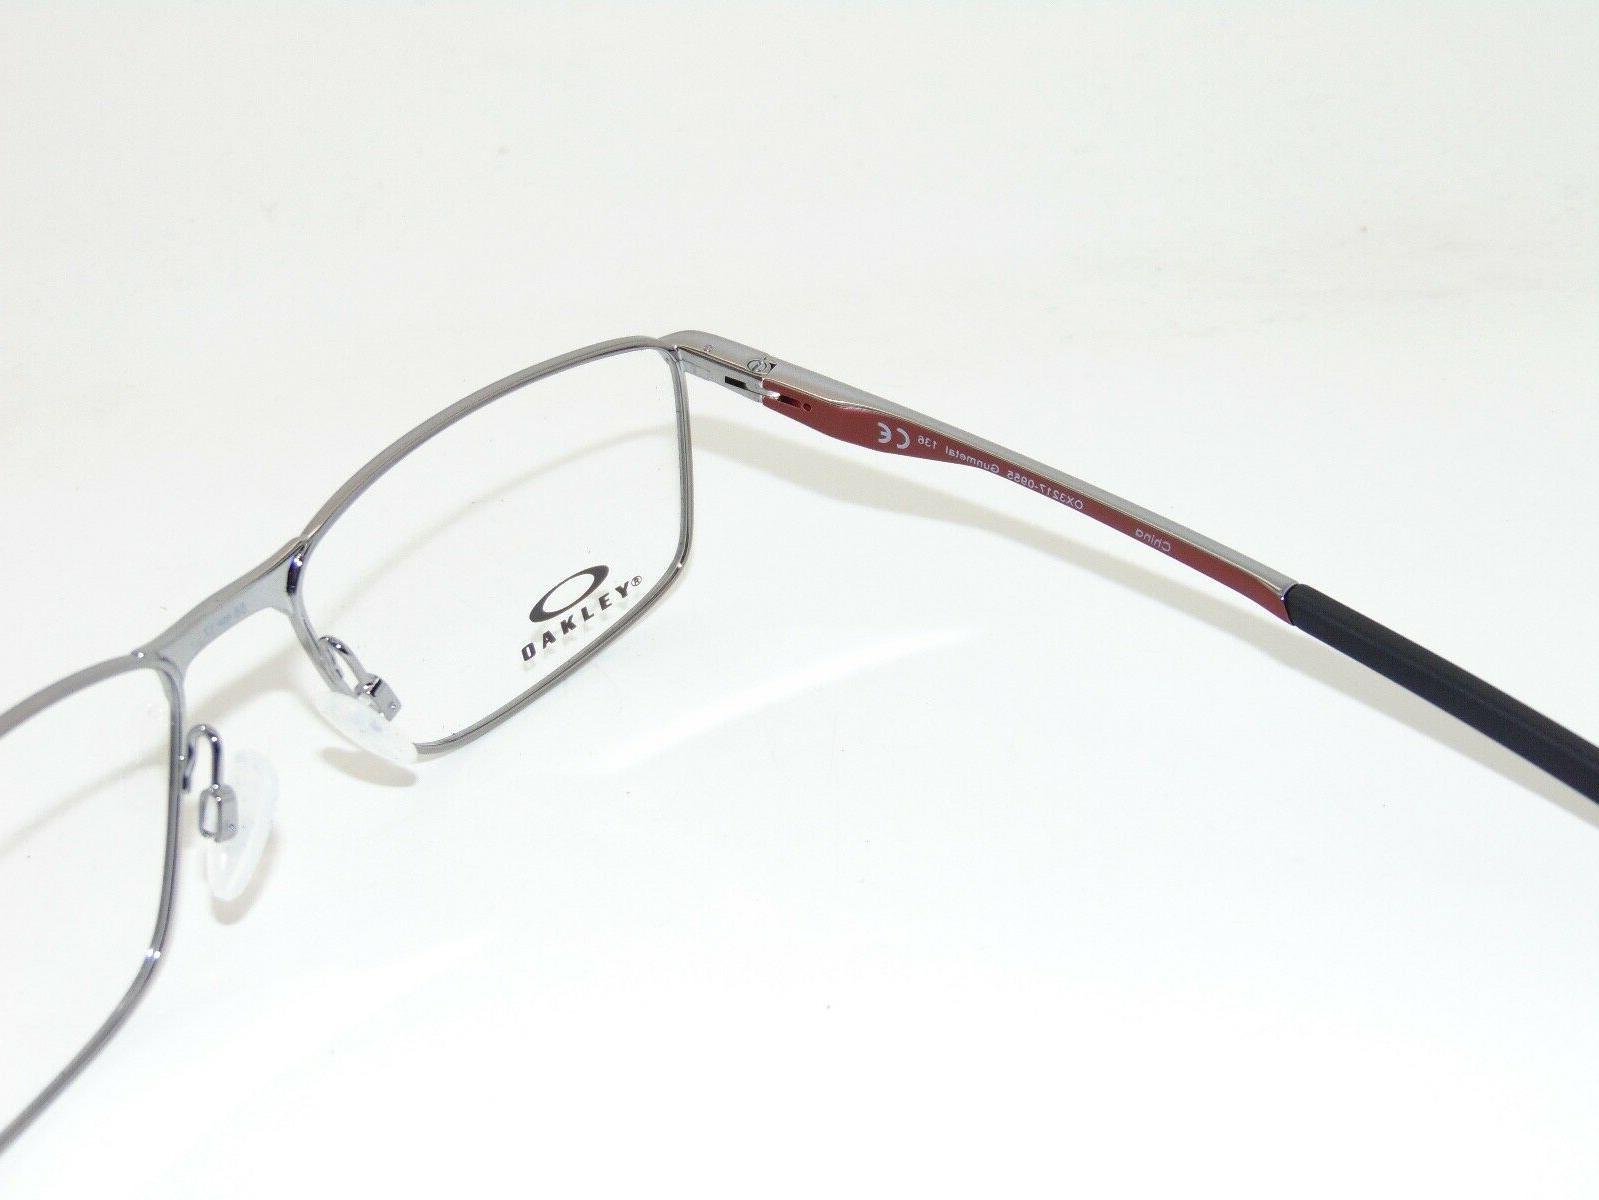 OAKLEY OX3217-0955 Gunmetal/Cardinal 55mm Authentic Eyeglasses